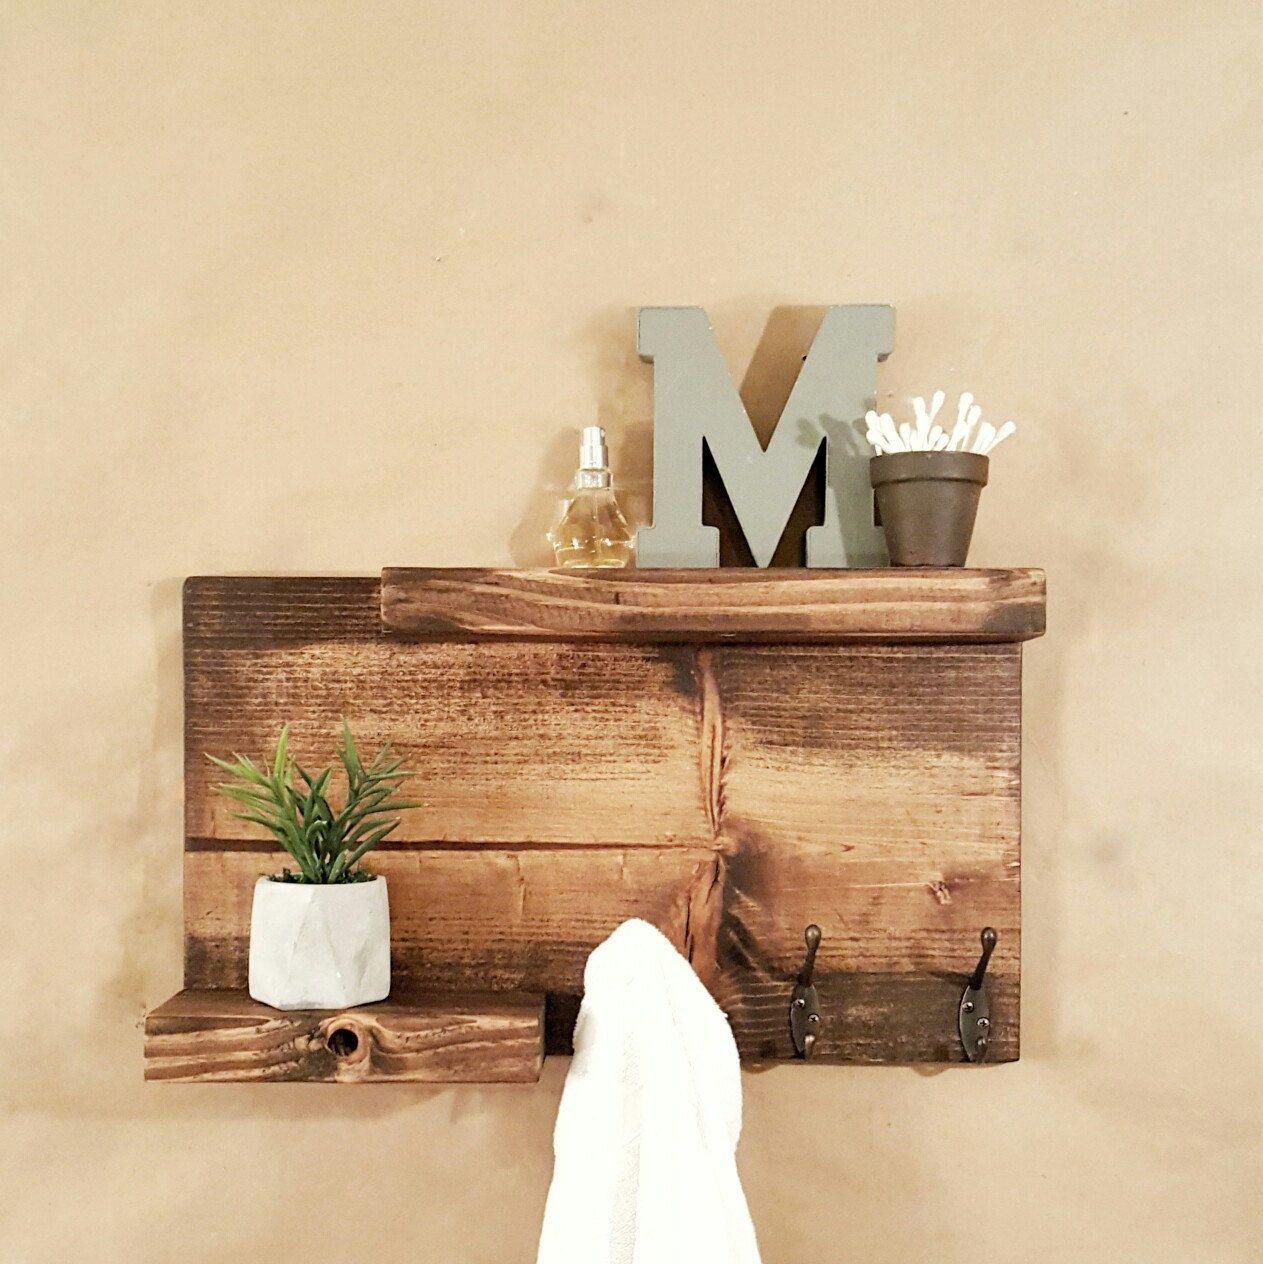 Bathroom Shelf With Towel/robe Hooks